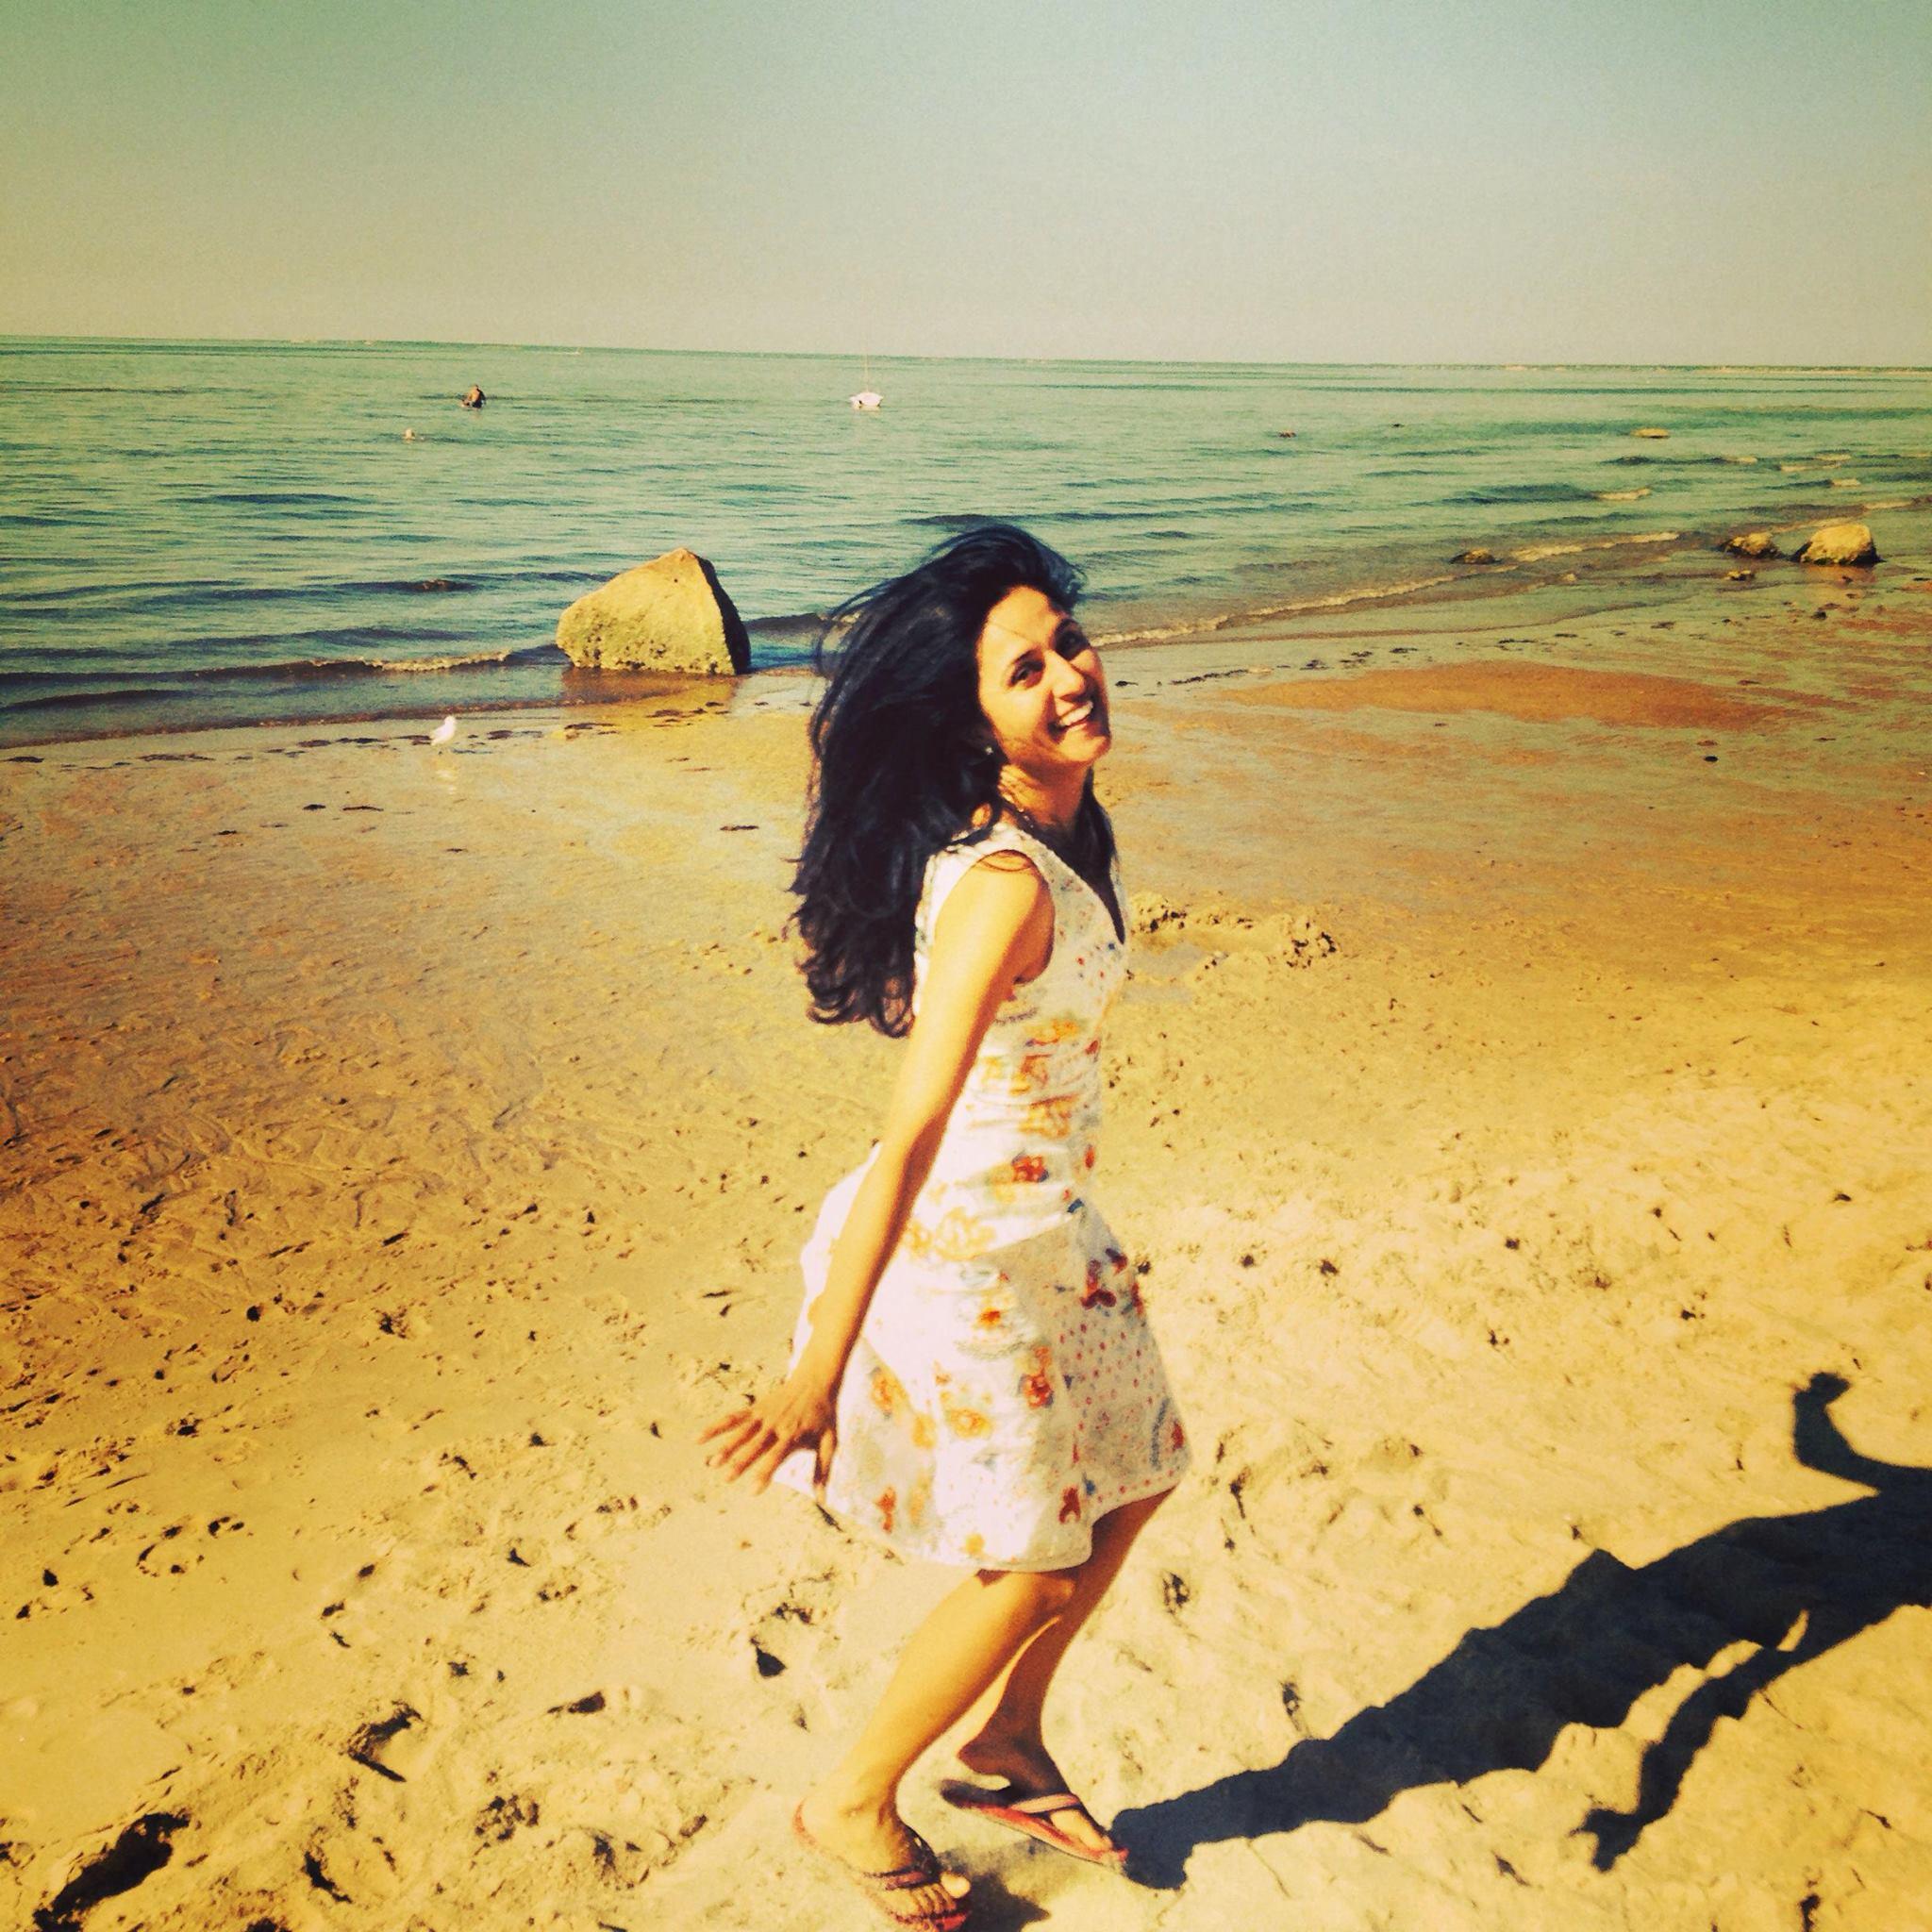 Bindu, cuando la sonrisa cautiva tu alma.